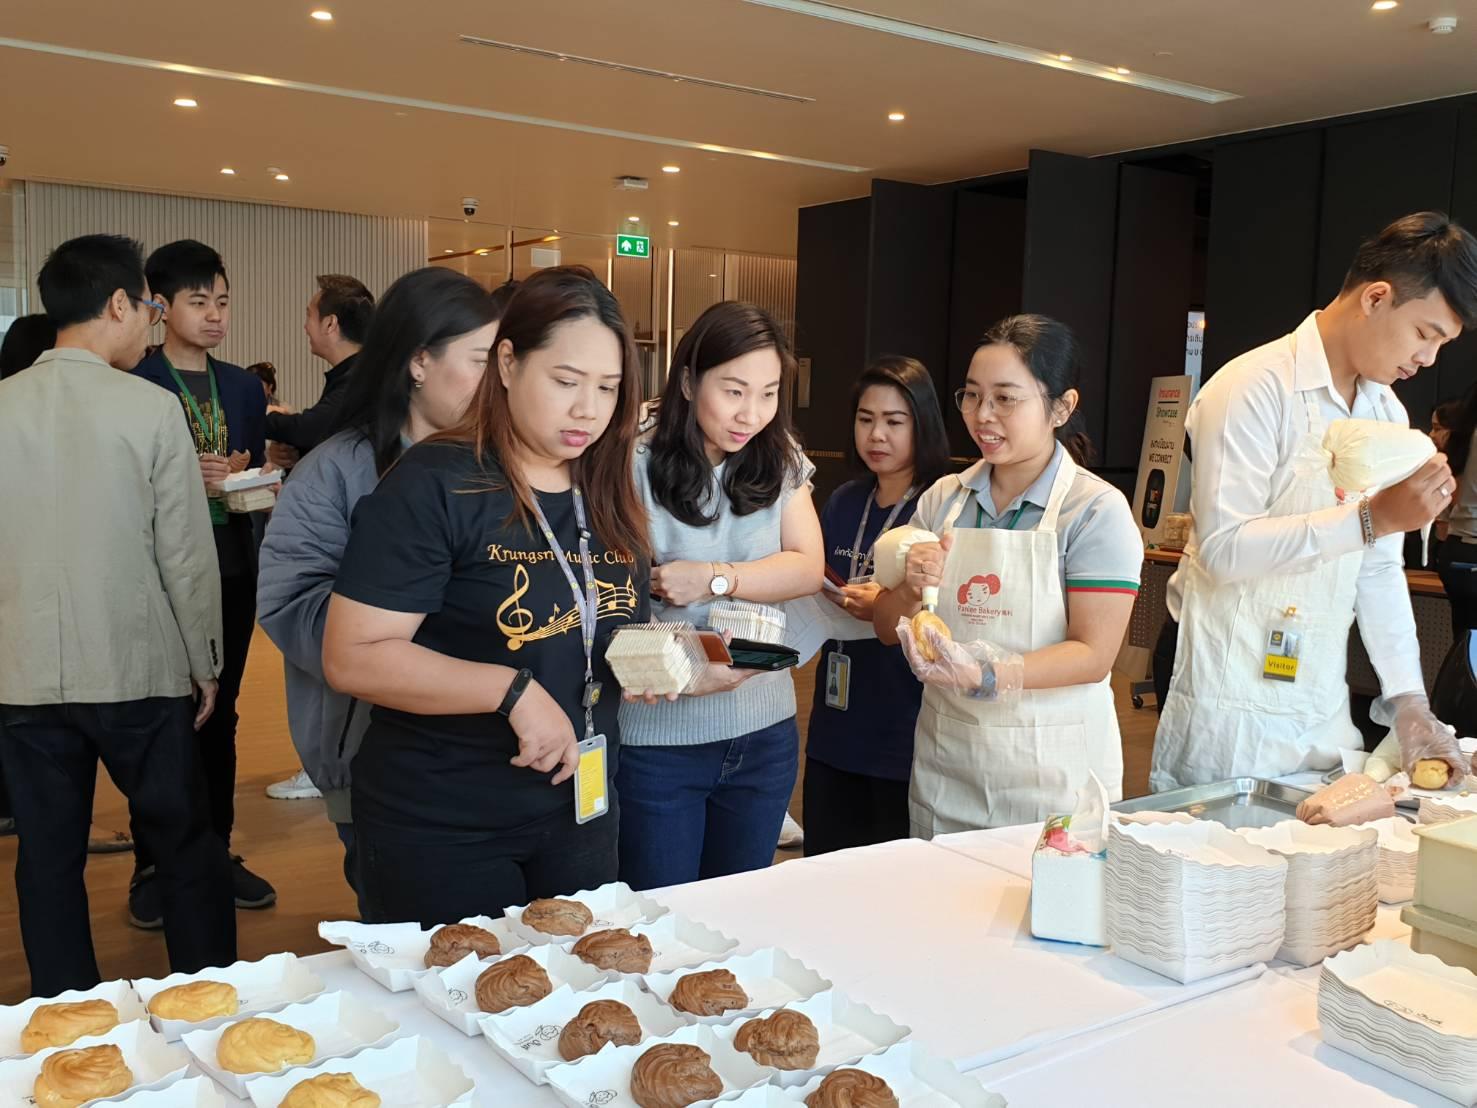 Catering33-snackbox-สแน็คบ๊อกซ์-จัดเลี้ยง-catering_สัมมนา-ประชุม-ขนมปัง-ขนมเบรค-อาหารว่าง-lunchbox-CoffeeBreak-foodstallmenu